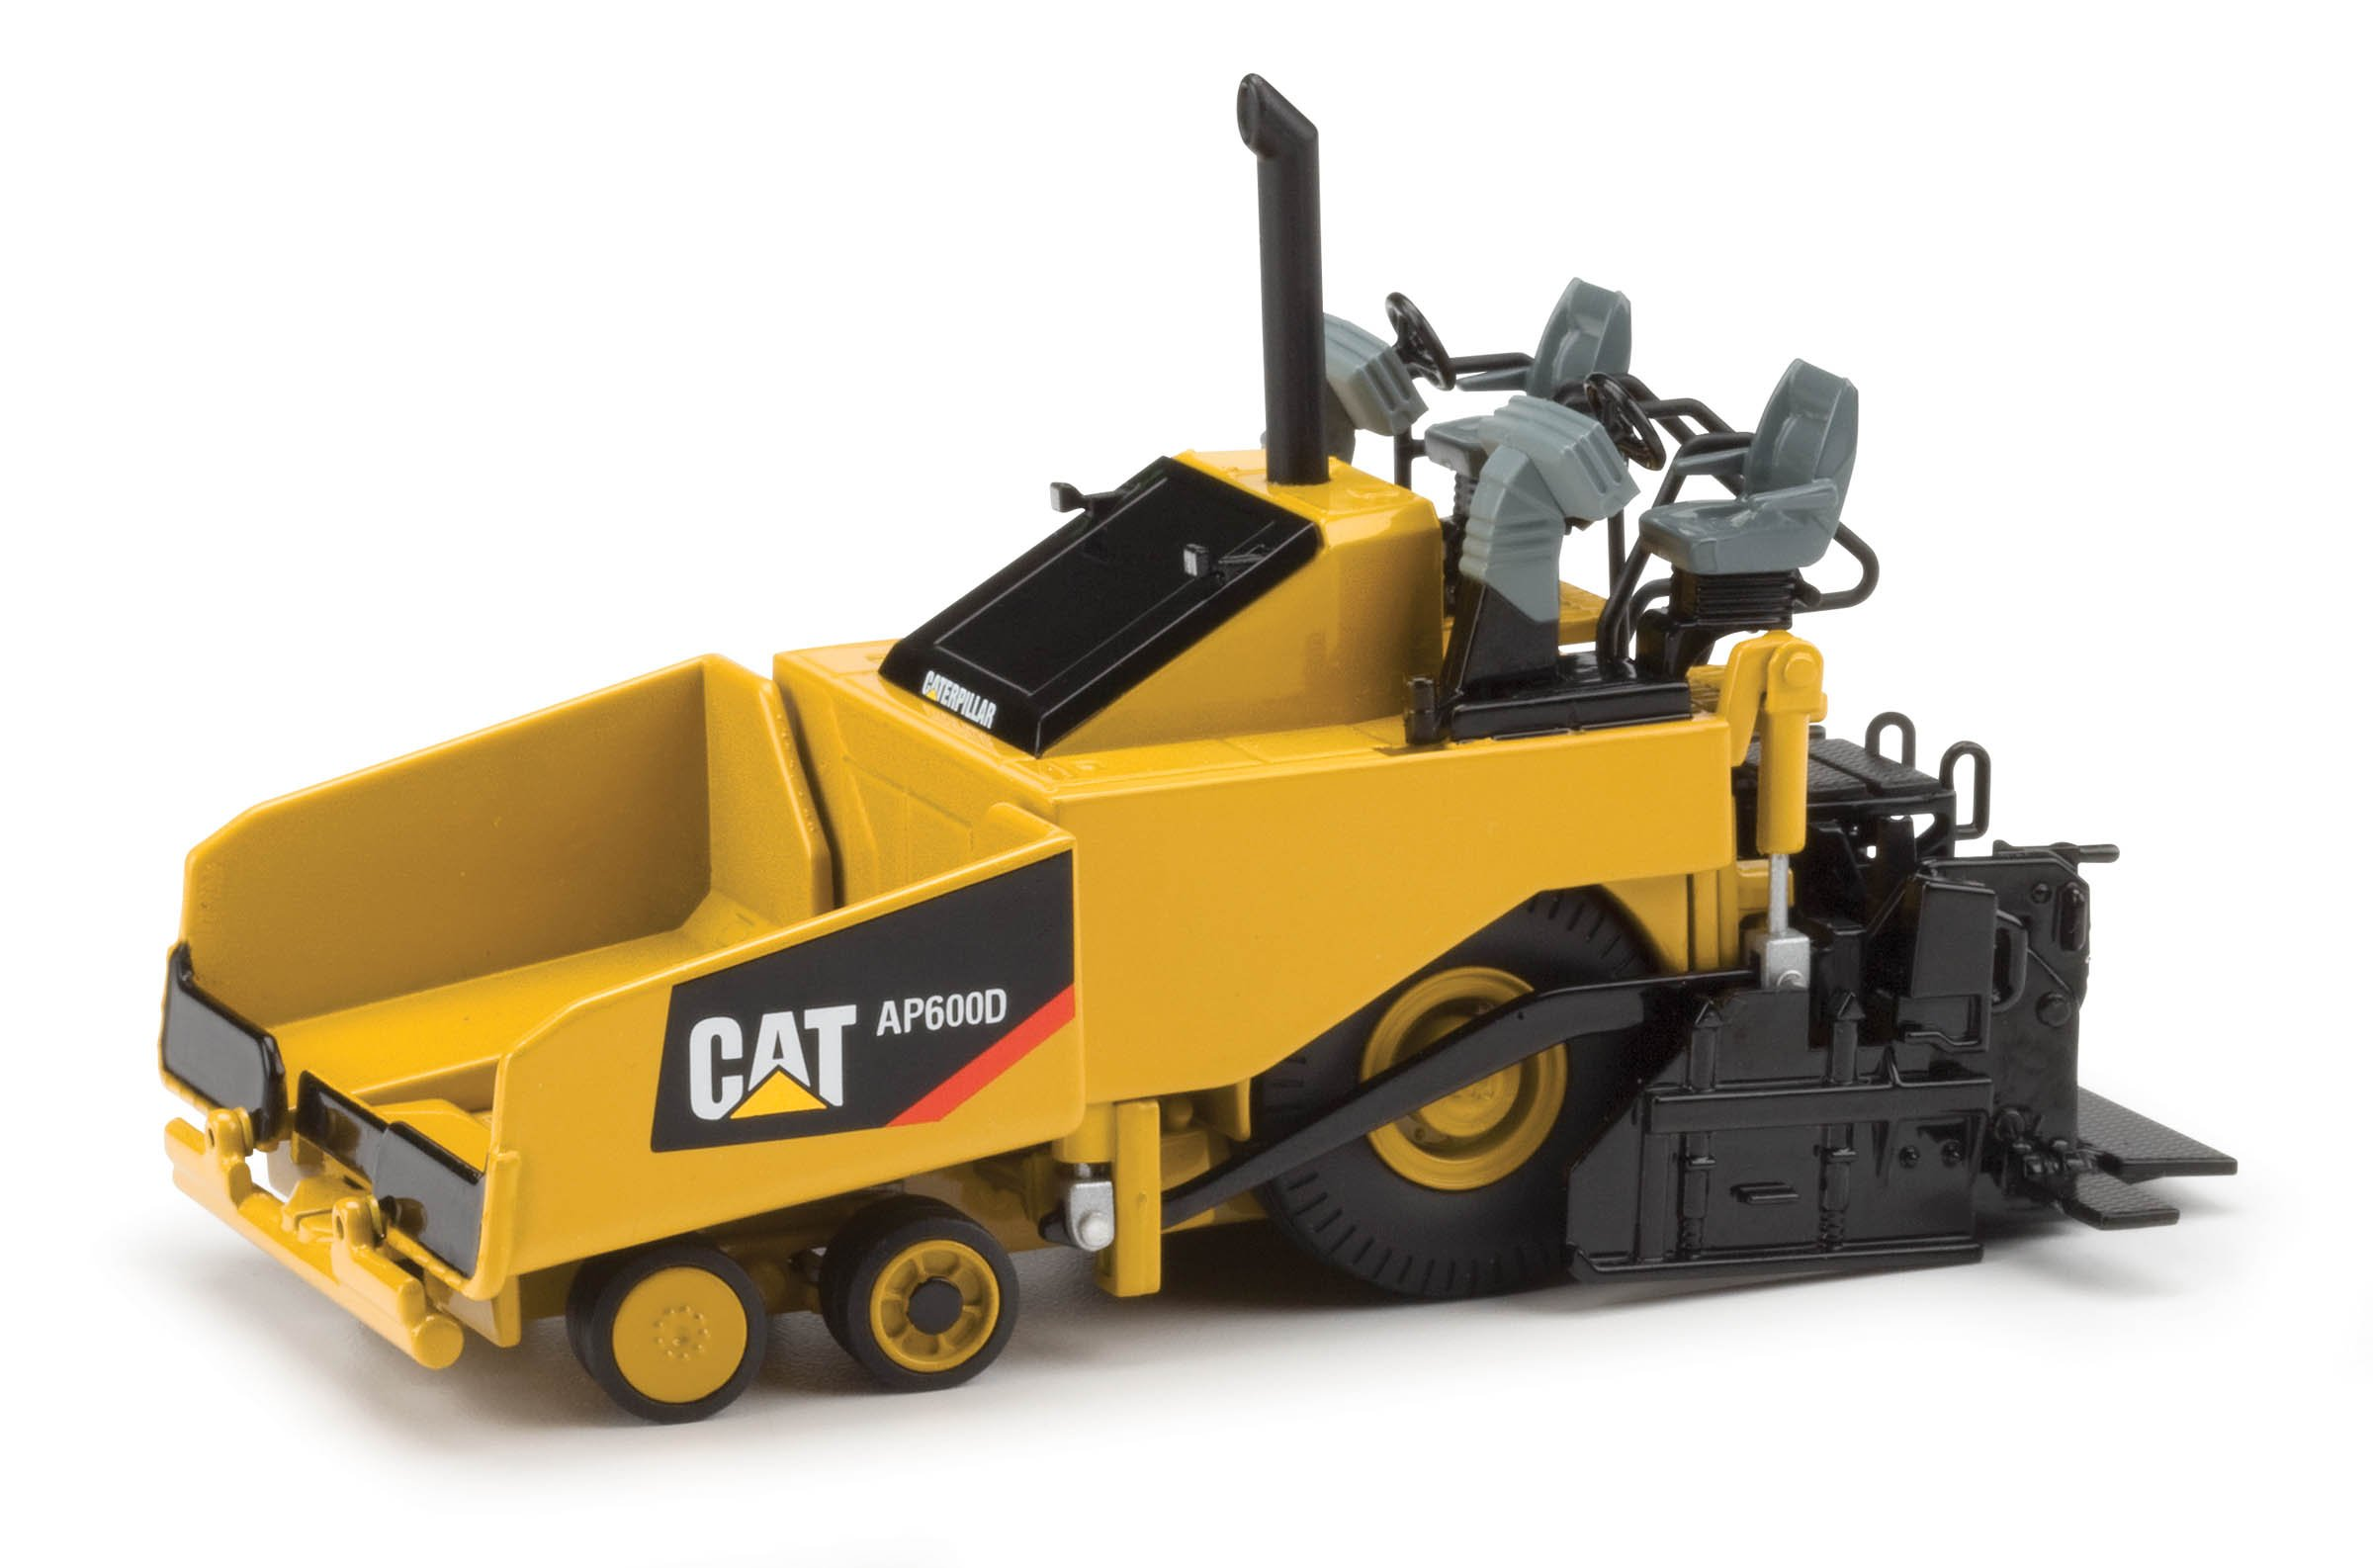 Norscot Cat AP600D Asphalt Paver (1:50 Scale), Caterpillar Yellow